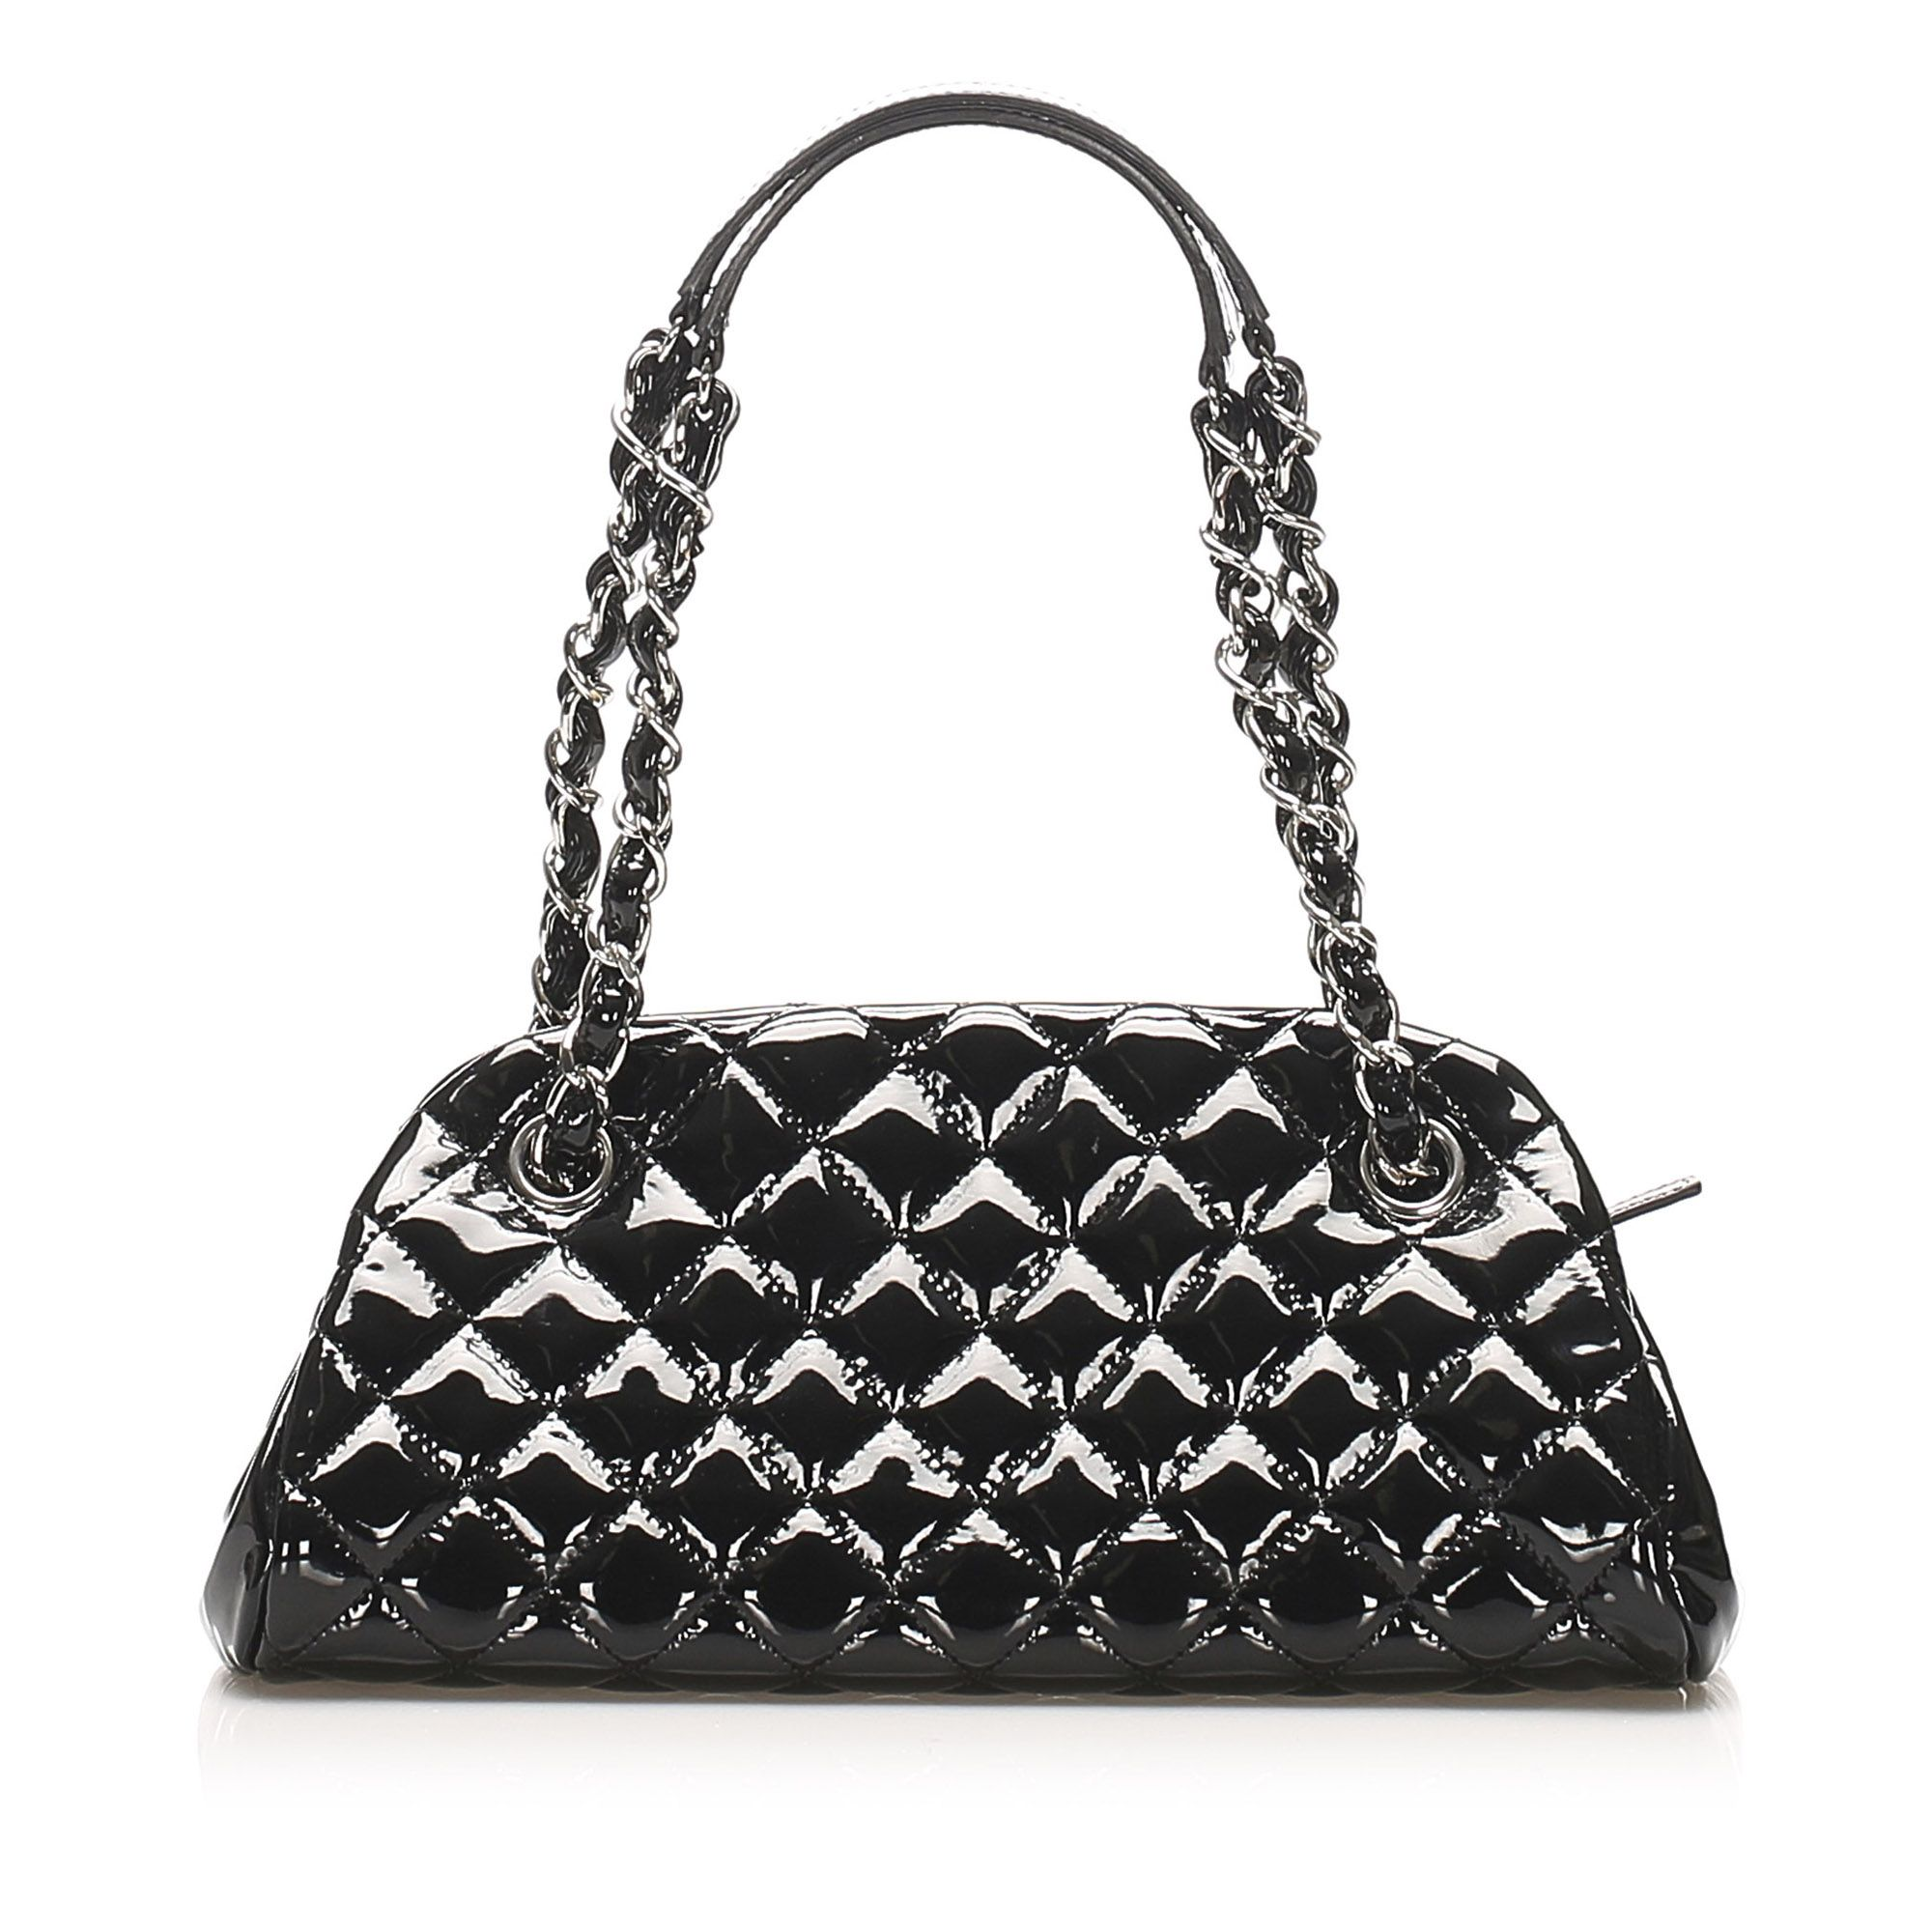 Vintage Chanel Mademoiselle Patent Leather Bowling Bag Black